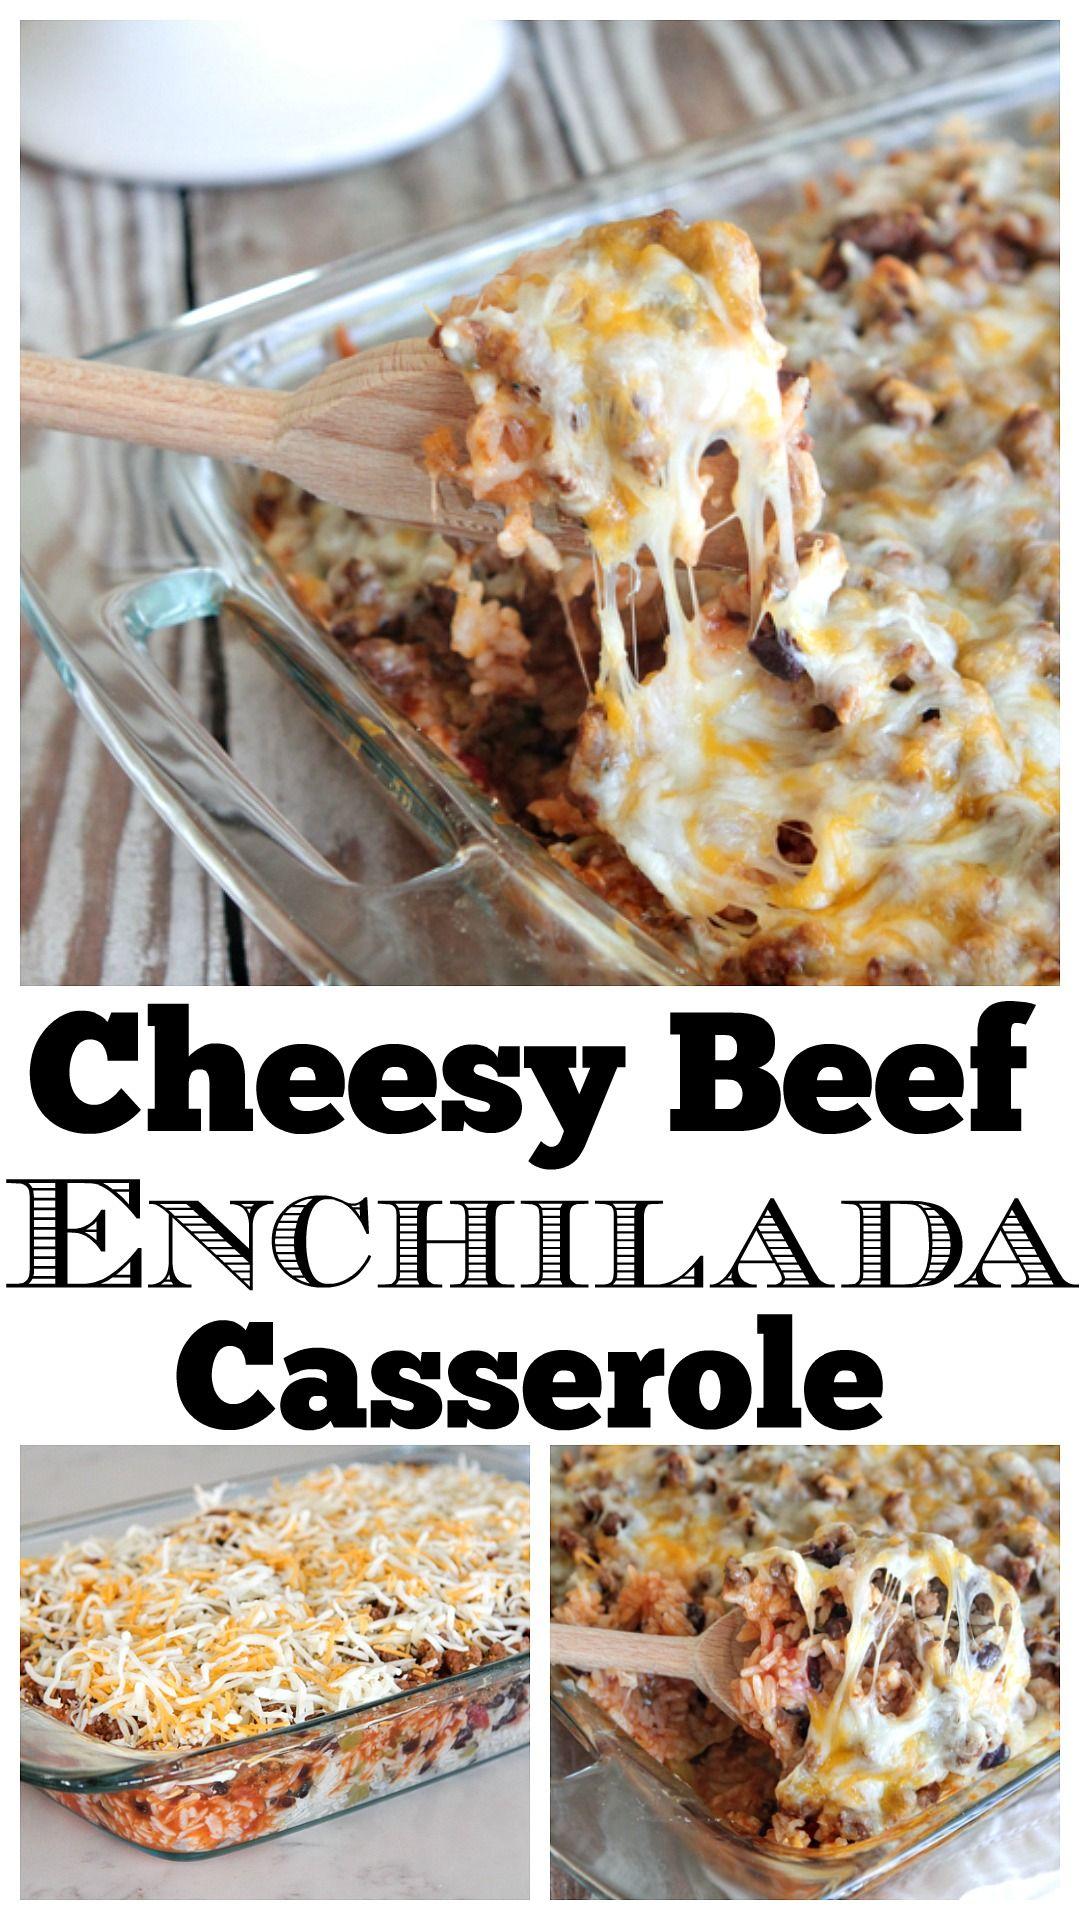 Cheesy Beef Enchilada Casserole Recipe Enchilada Casserole Beef Enchilada Casserole Beef Enchiladas